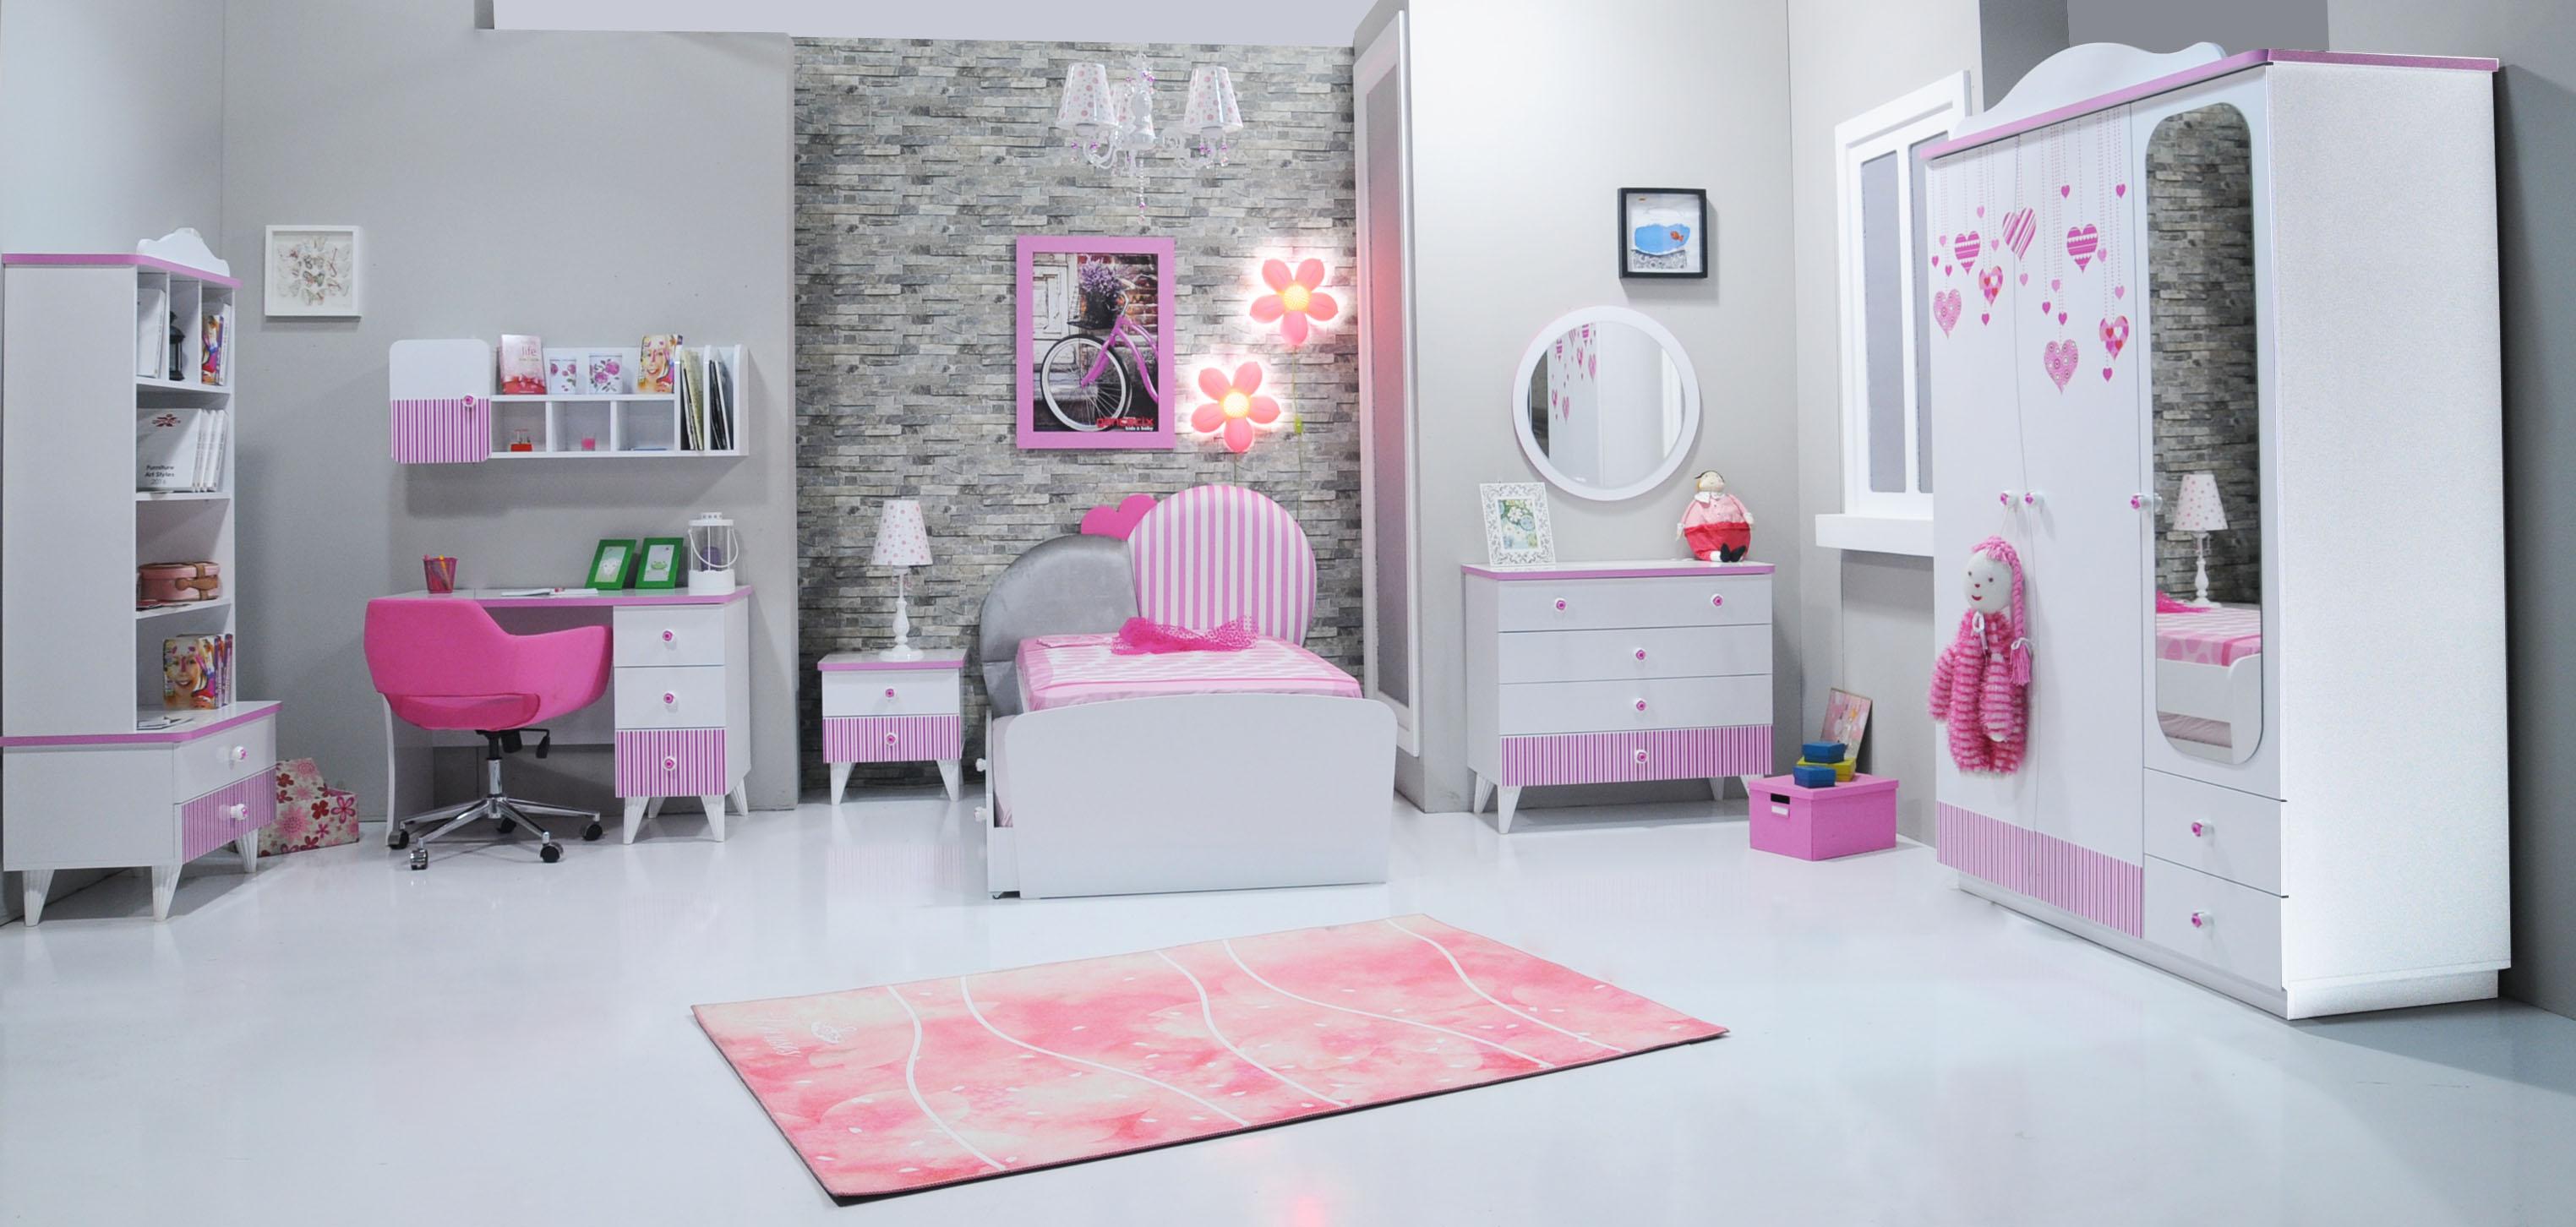 Kinderkamer set aanbiedingen specialist in kinderkamers en slaapkamers